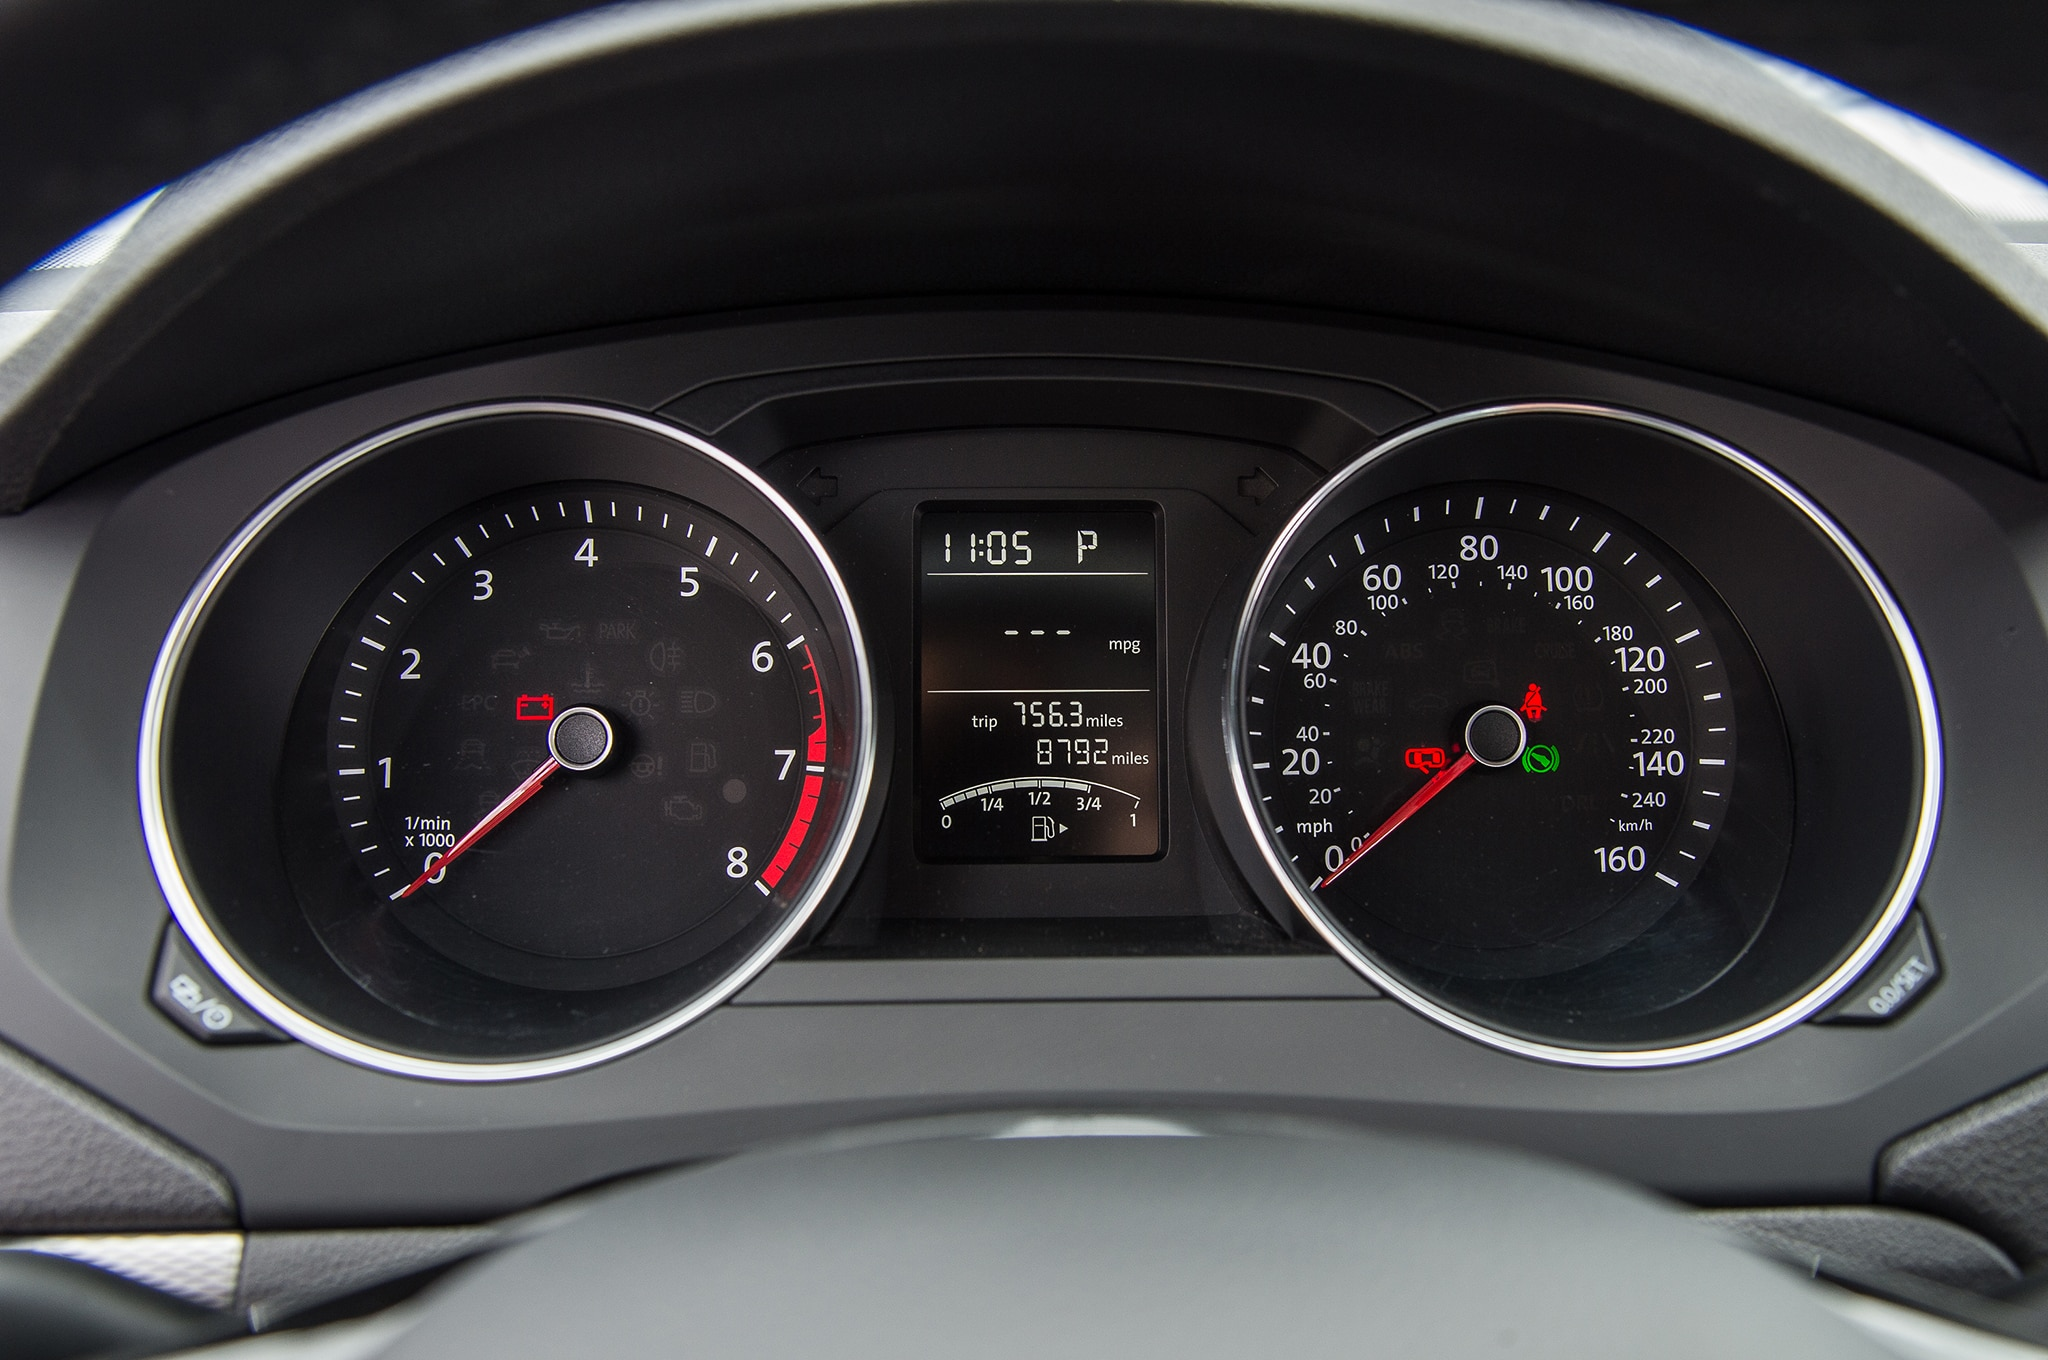 Volkswagen Jetta 1.4T SE 2016: Primera Prueba